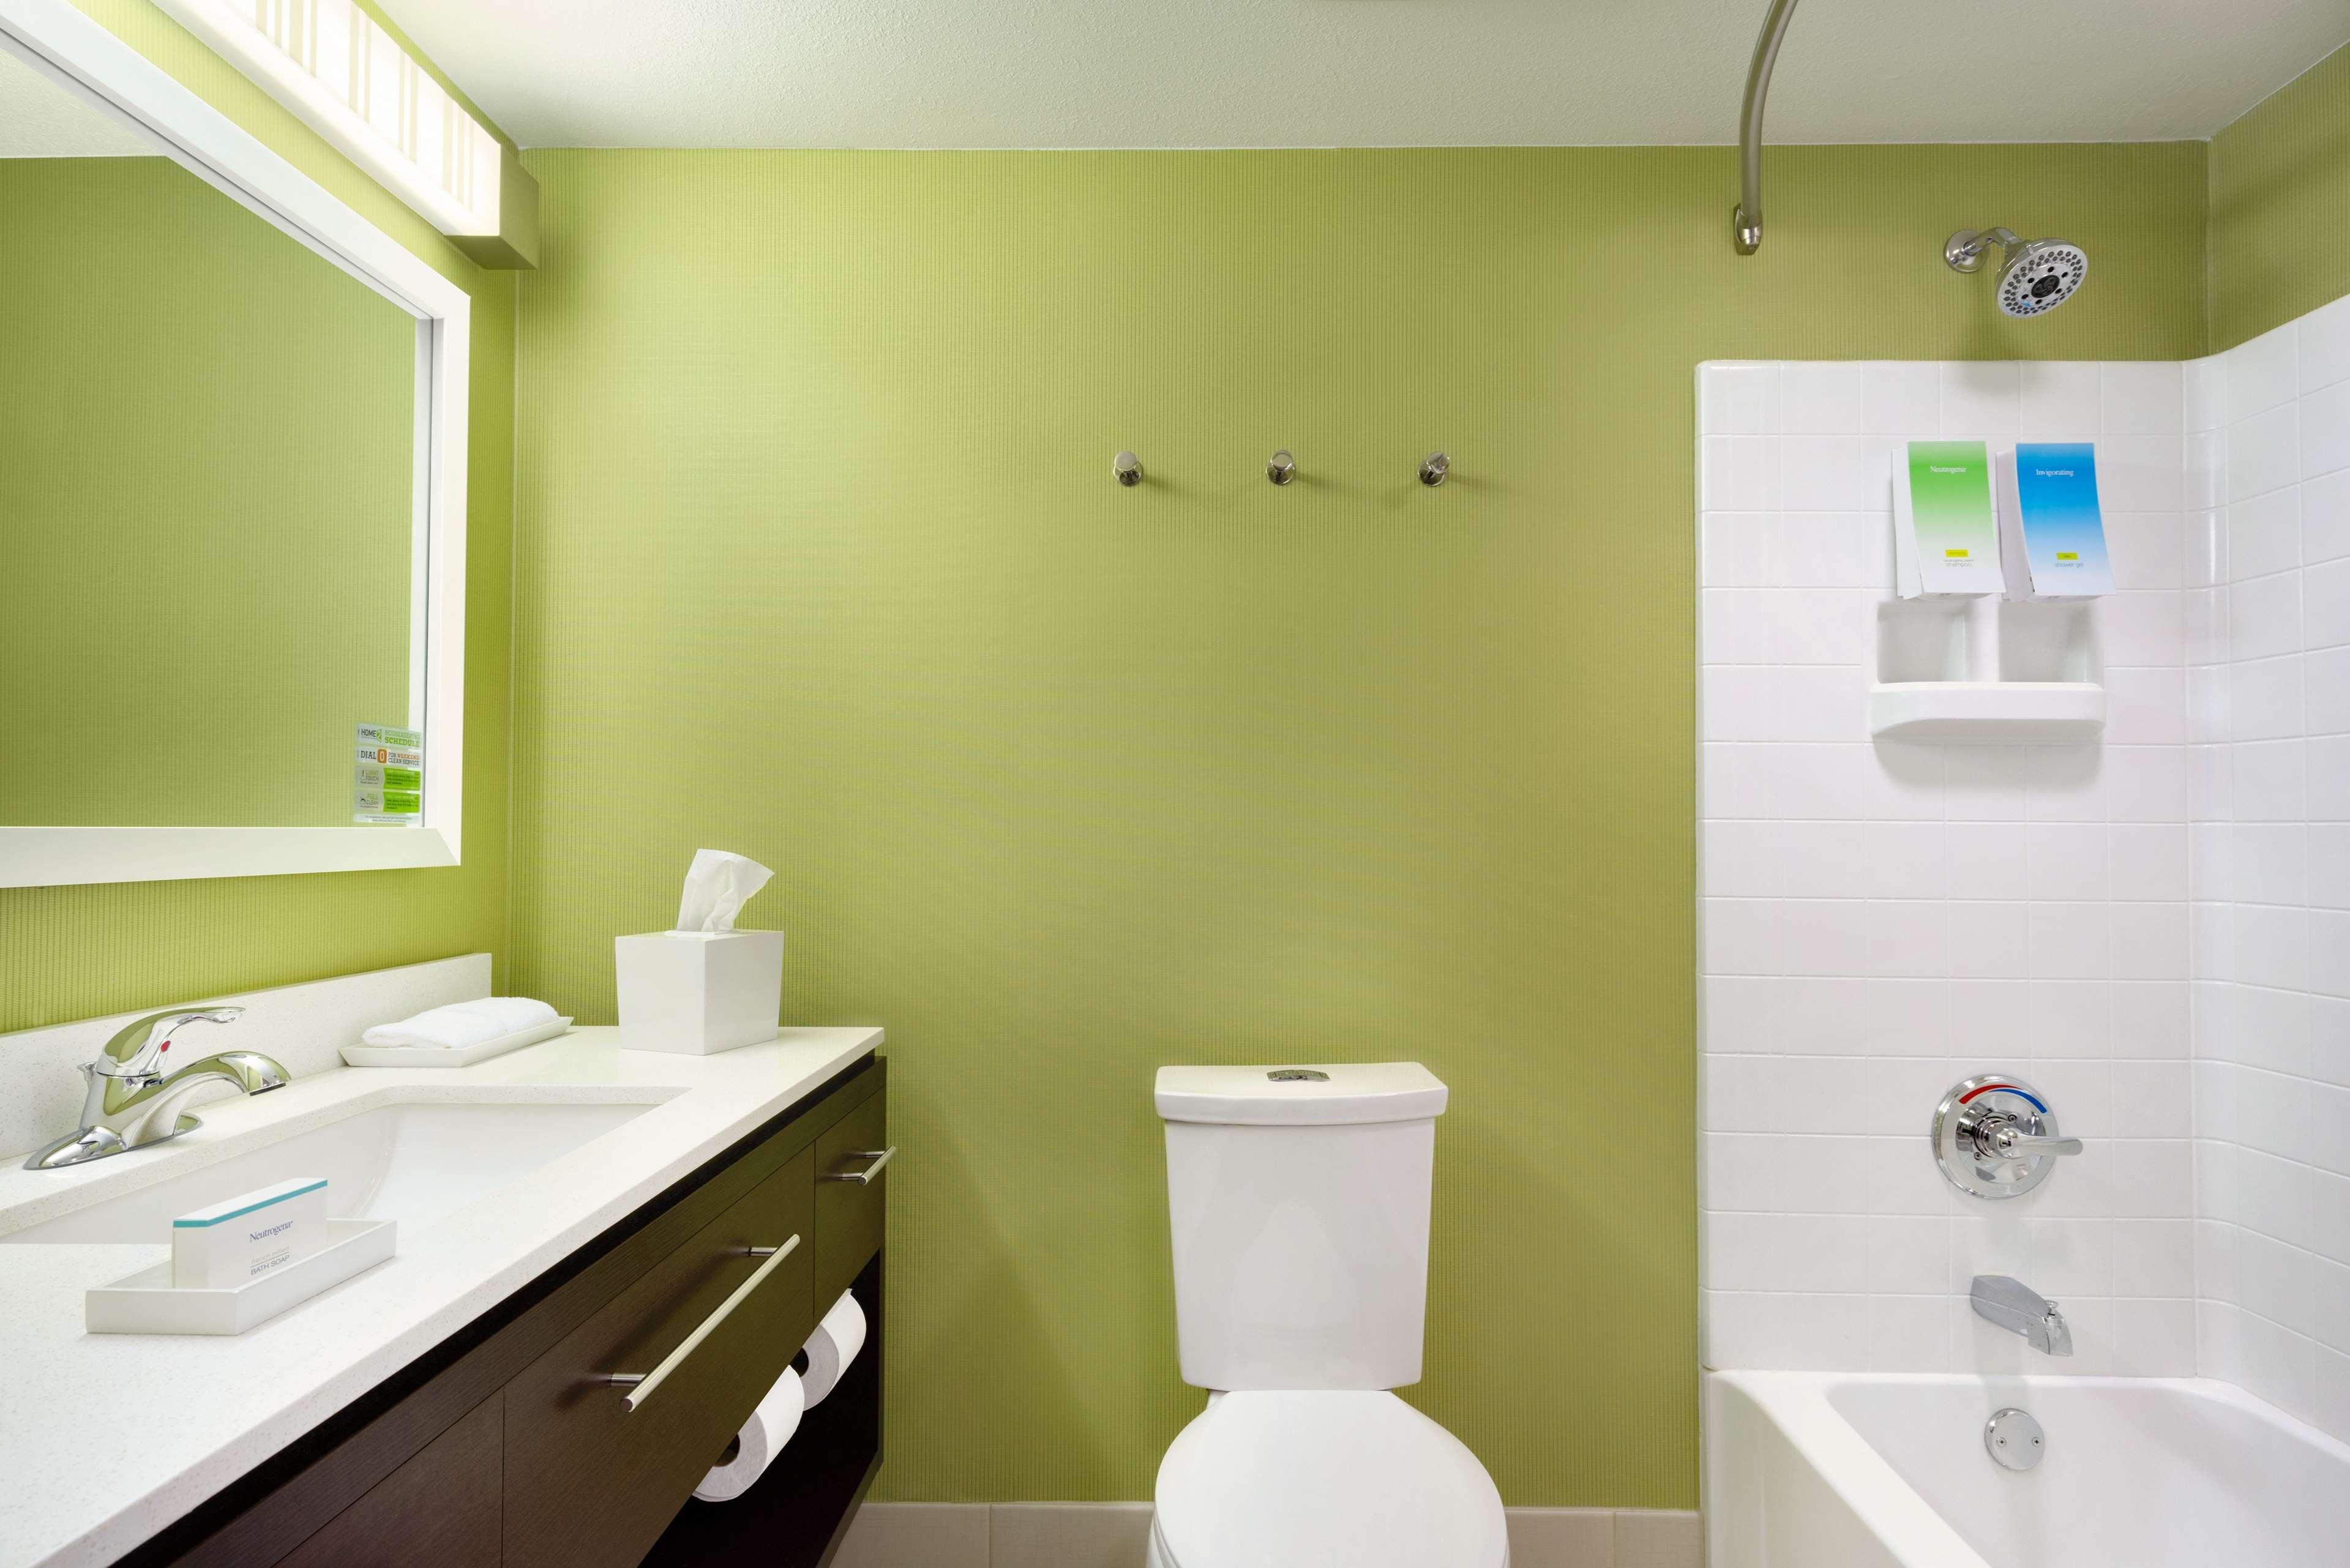 Home2 Suites by Hilton Leavenworth Downtown image 29